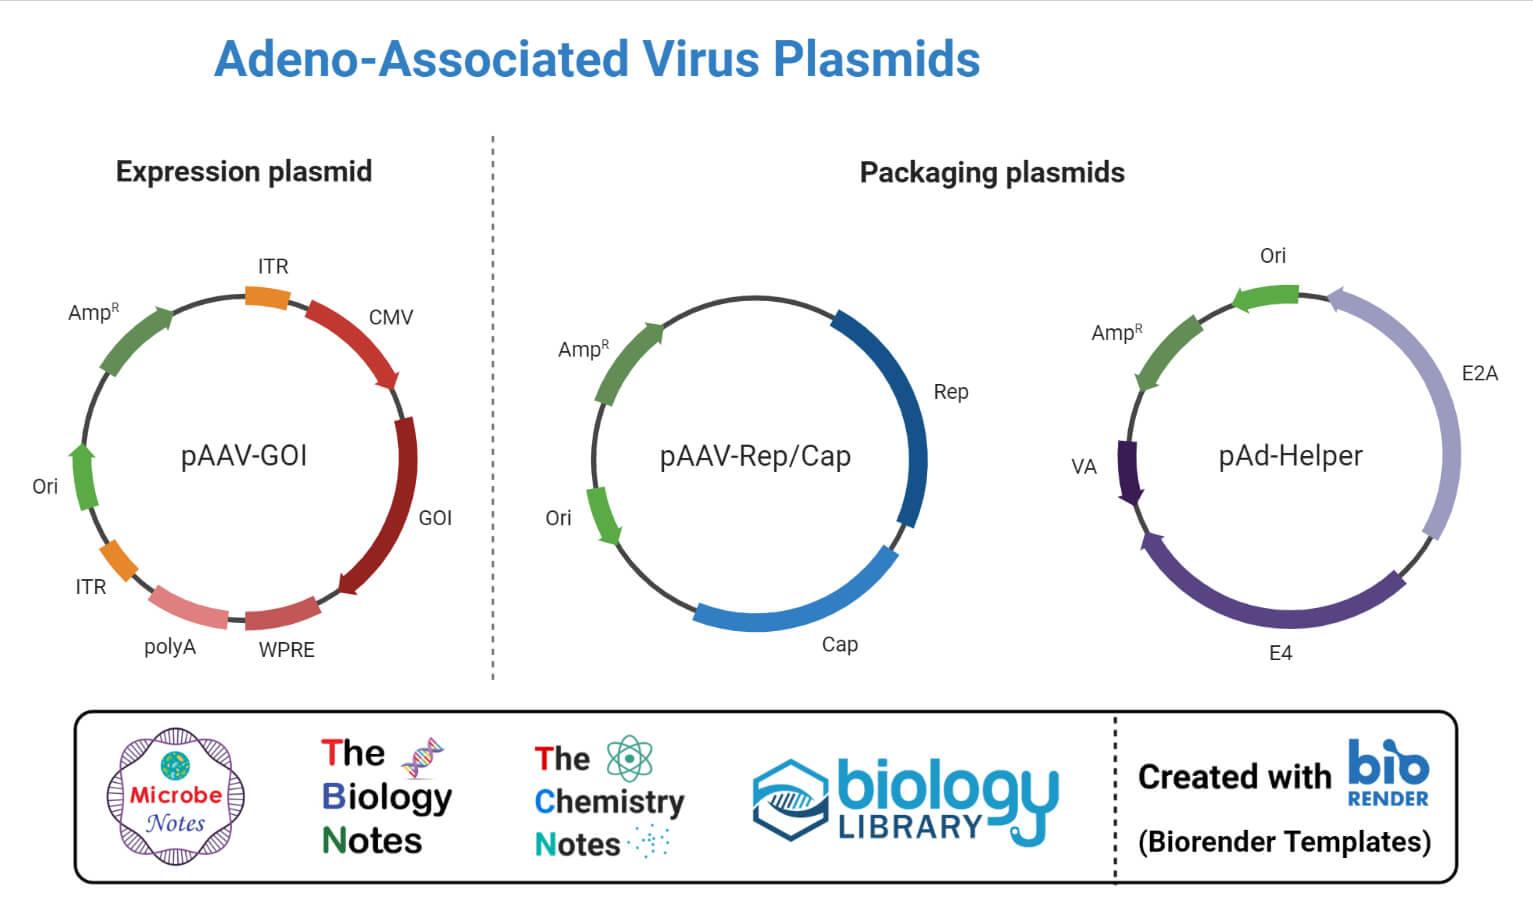 Plasmids for Adeno-Associated Virus Vector Production.